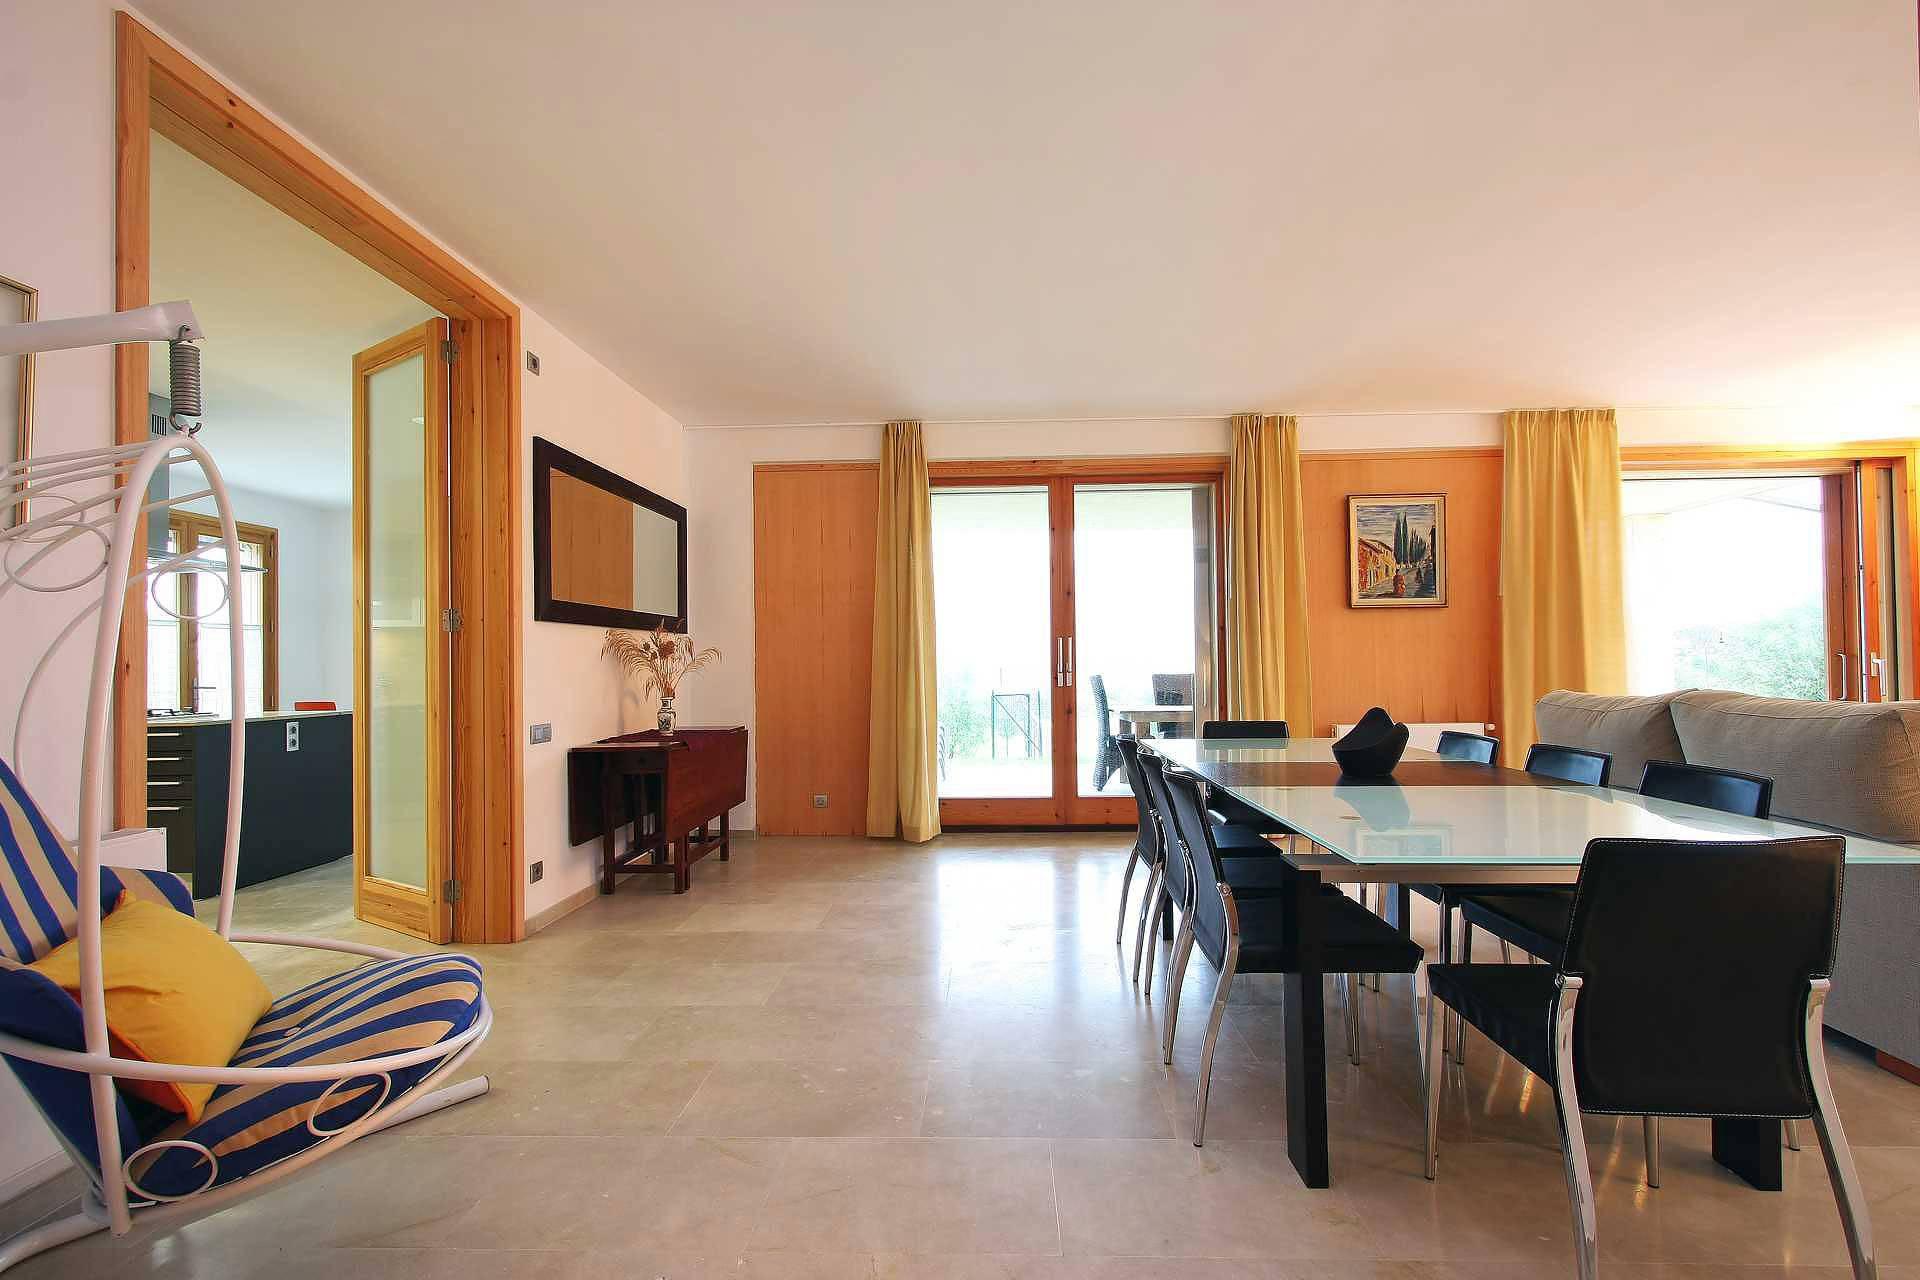 01-36 klassische Villa Mallorca Norden Bild 14